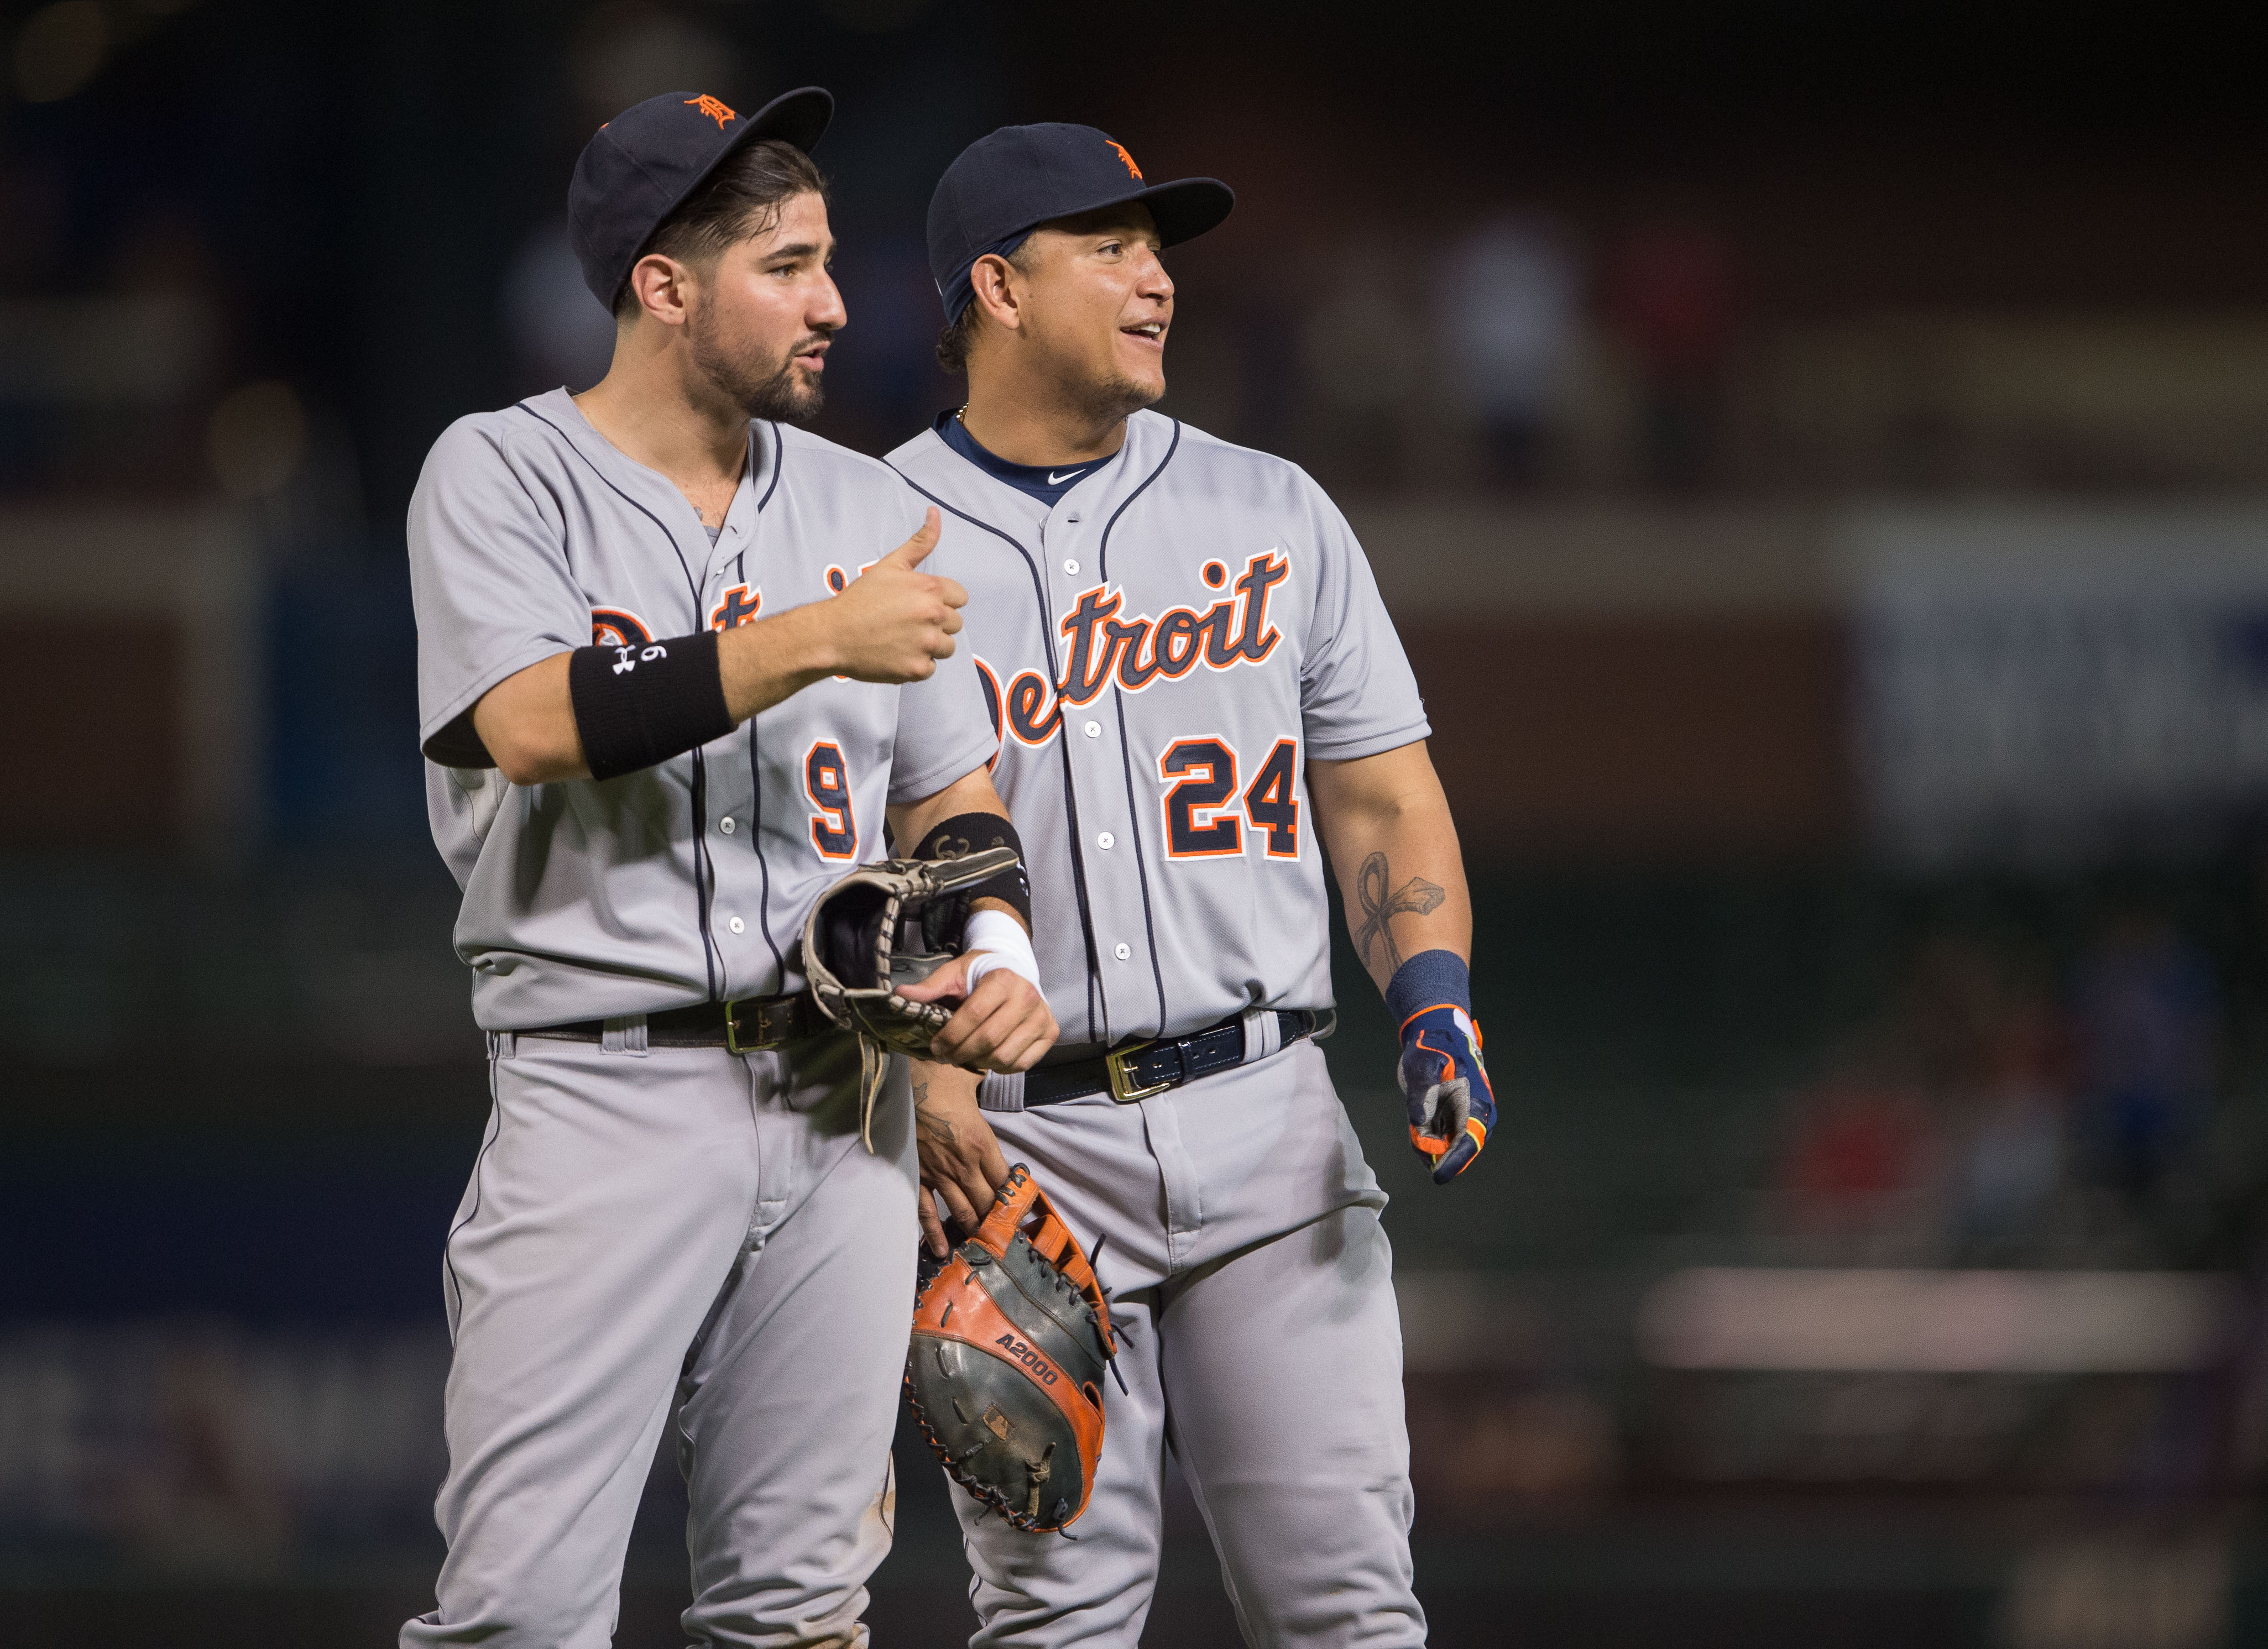 Fantasy Baseball: Evaluating Targets to Buy and Sell